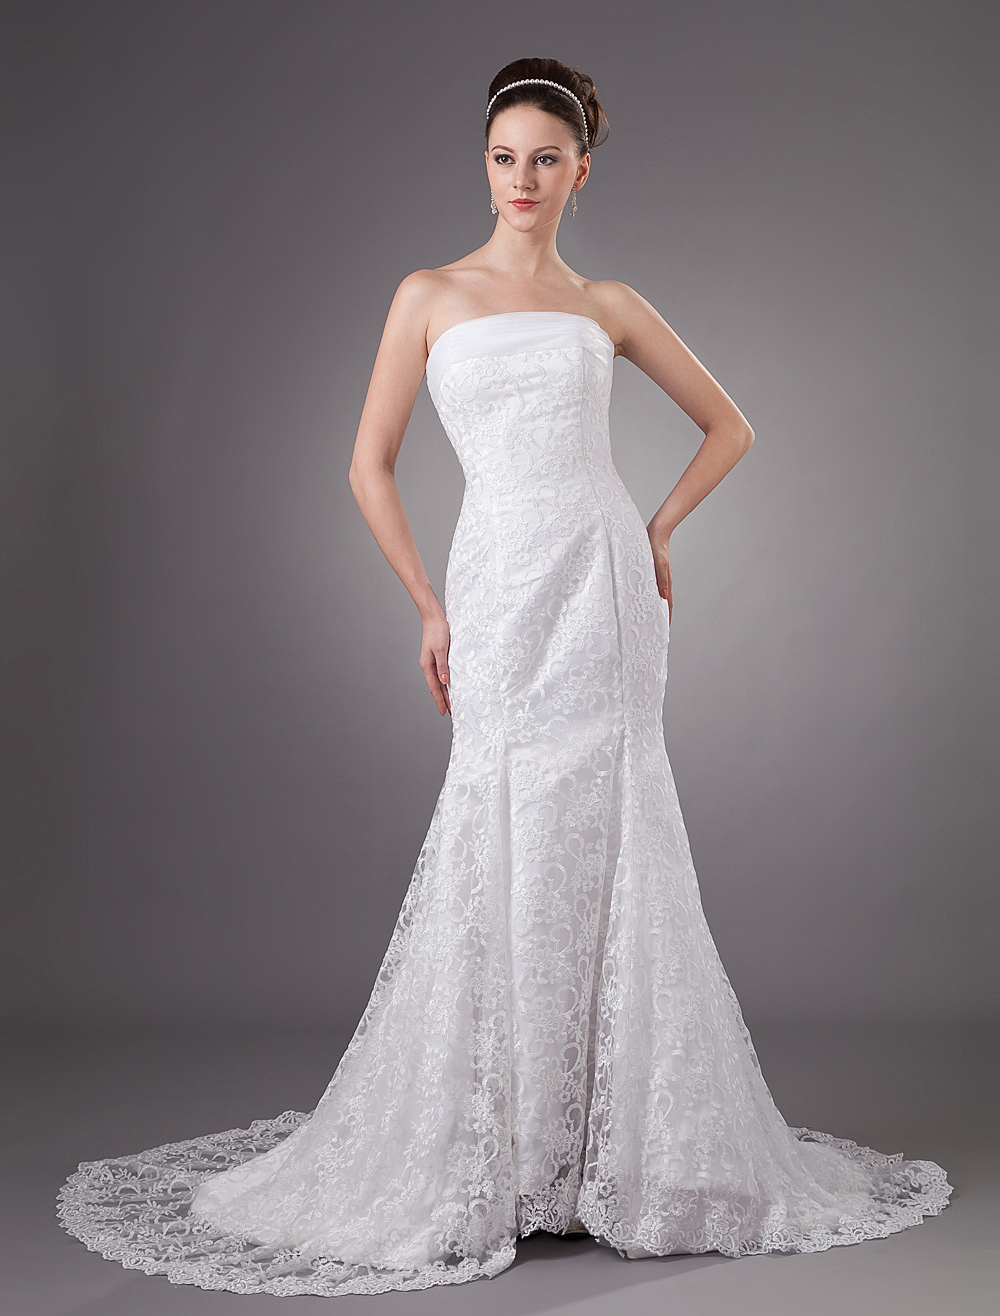 White Lace Beautiful Strapless Mermaid Trumpet Wedding Dress ...